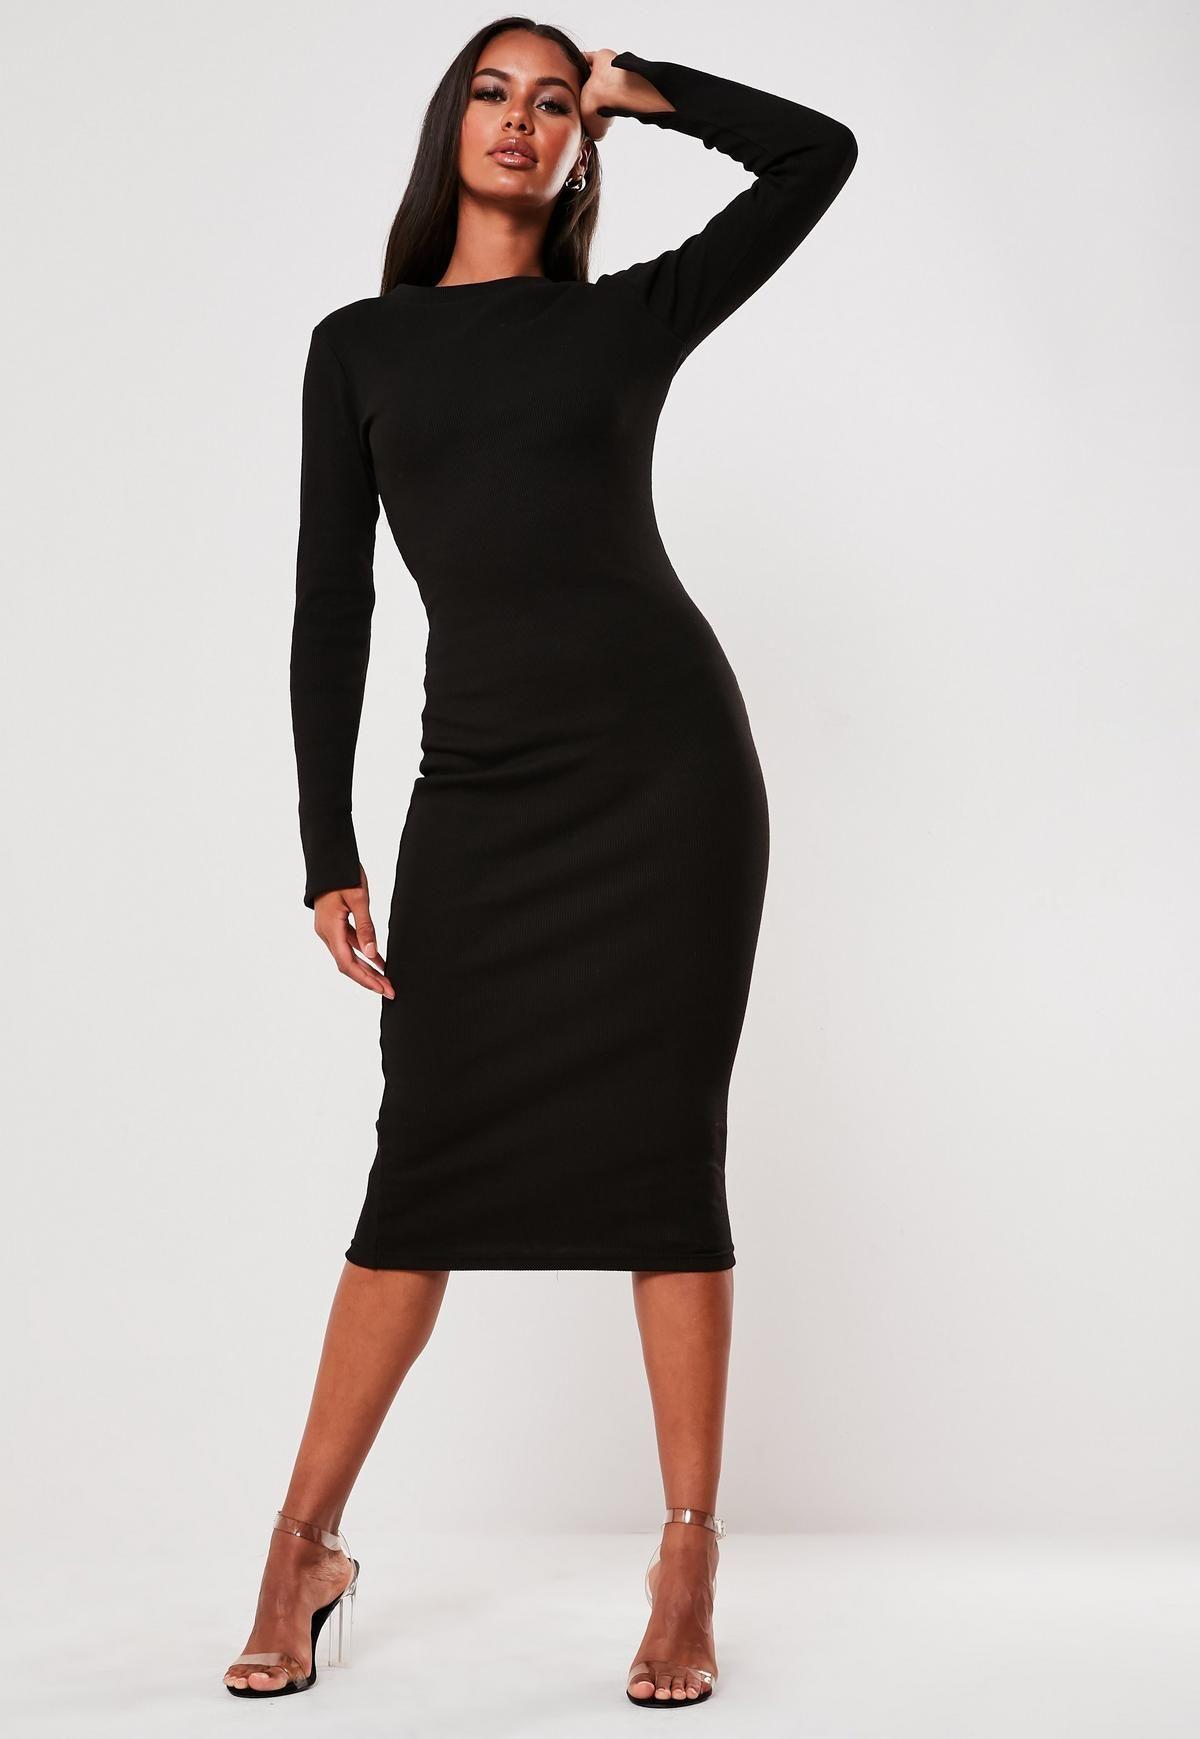 Black Heavy Rib Long Sleeve Midi Dress Missguided Long Sleeve Midi Dress Midi Dress Bodycon Midi Dress With Sleeves [ 1739 x 1200 Pixel ]